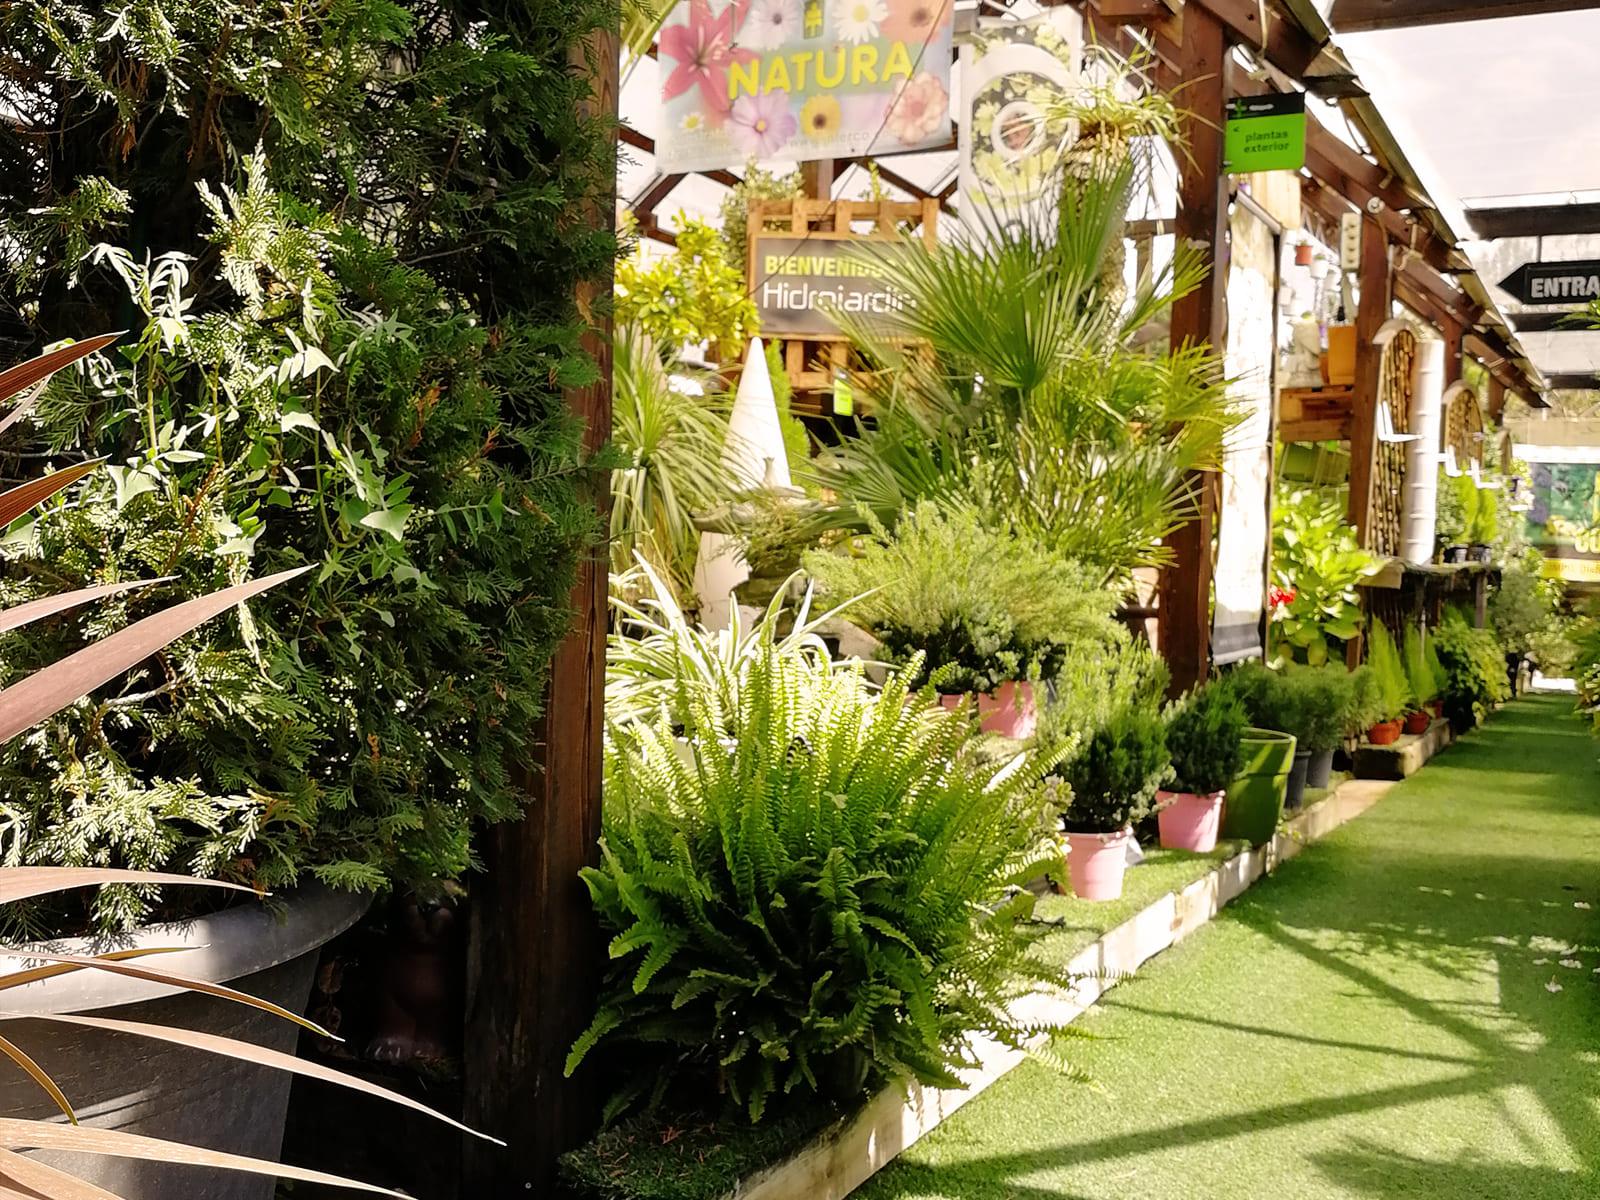 centro-jardineria-garden-invernadero-artesanal-madera-fuente-13_HIDROJARDIN-Bañeres